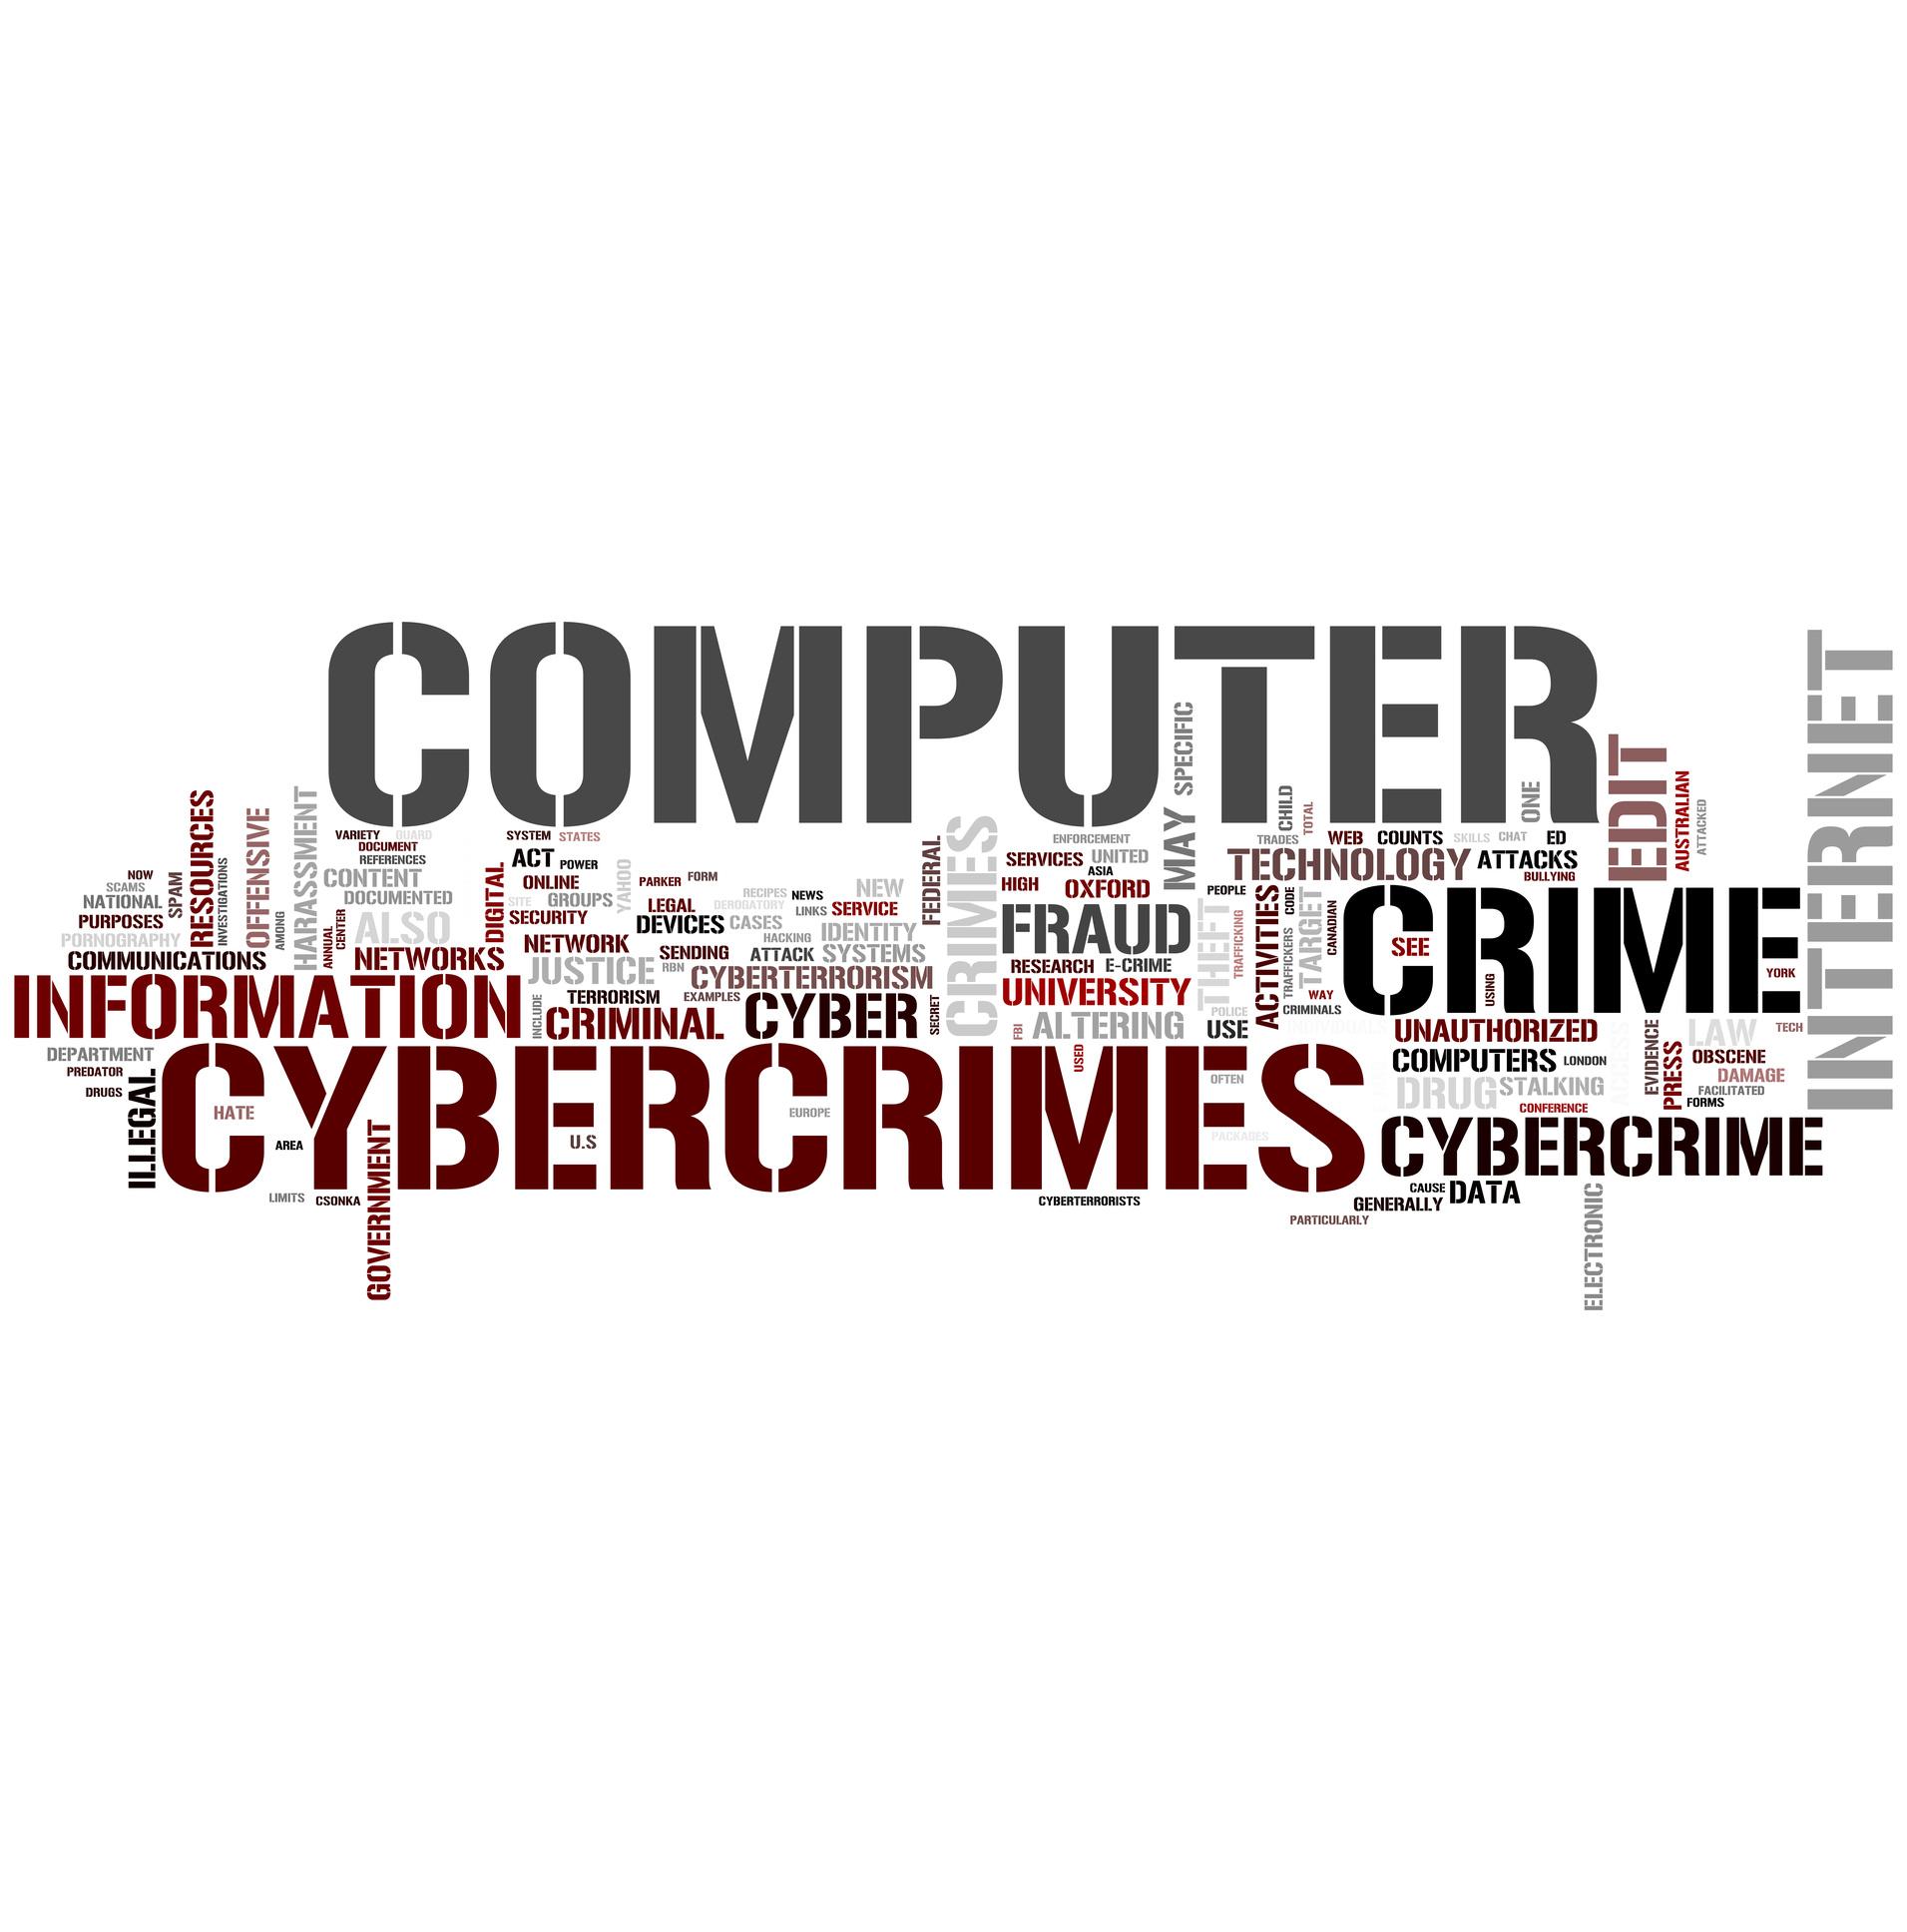 Botnets cybercrime